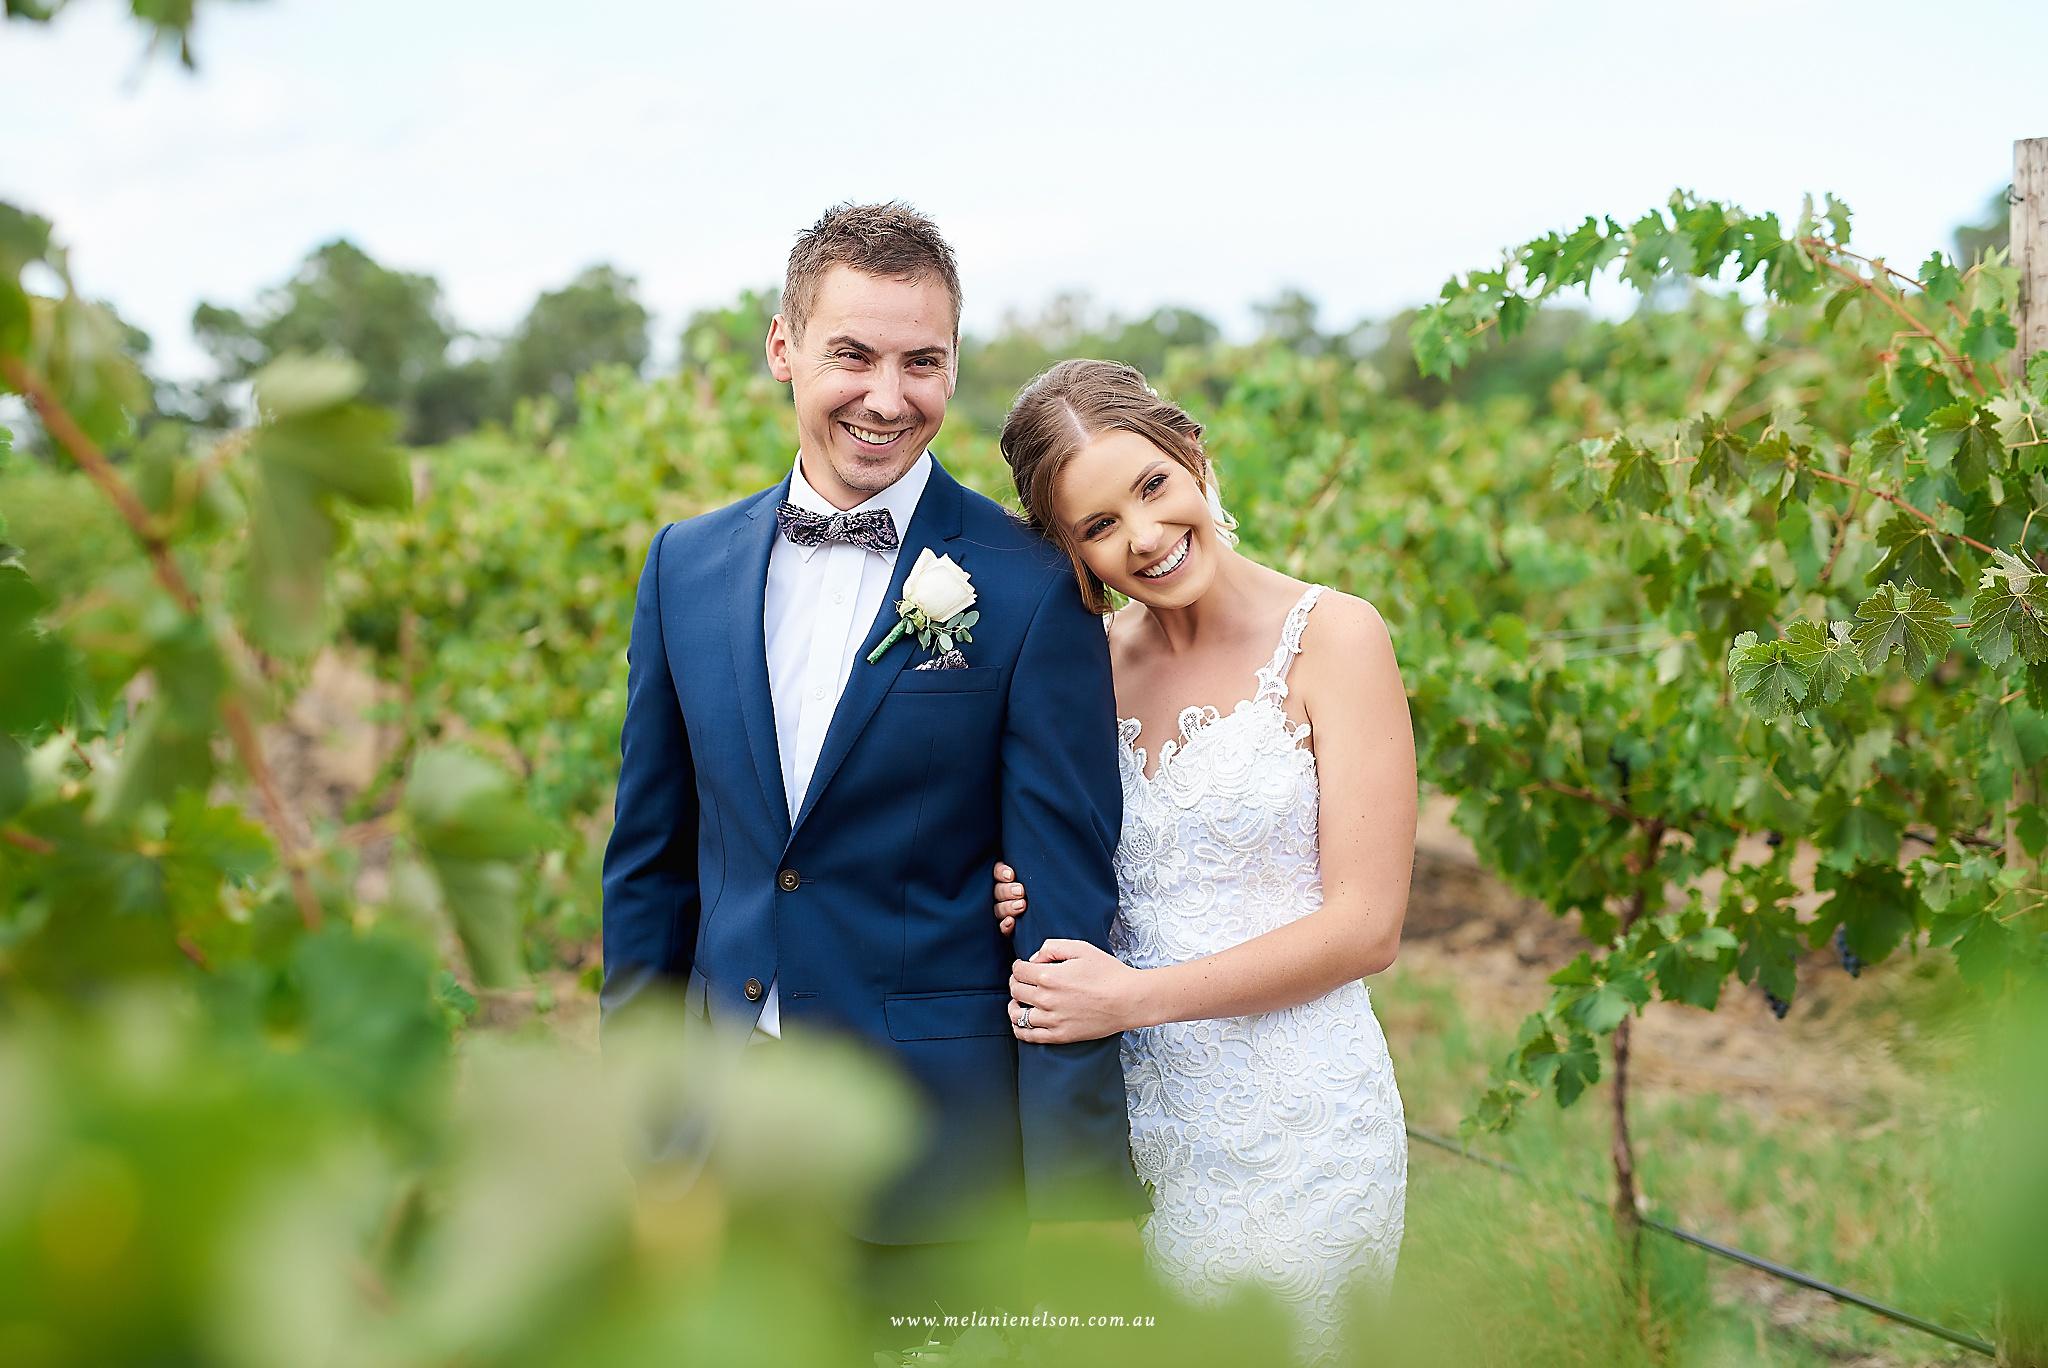 serafino_wedding_photography_0065.jpg